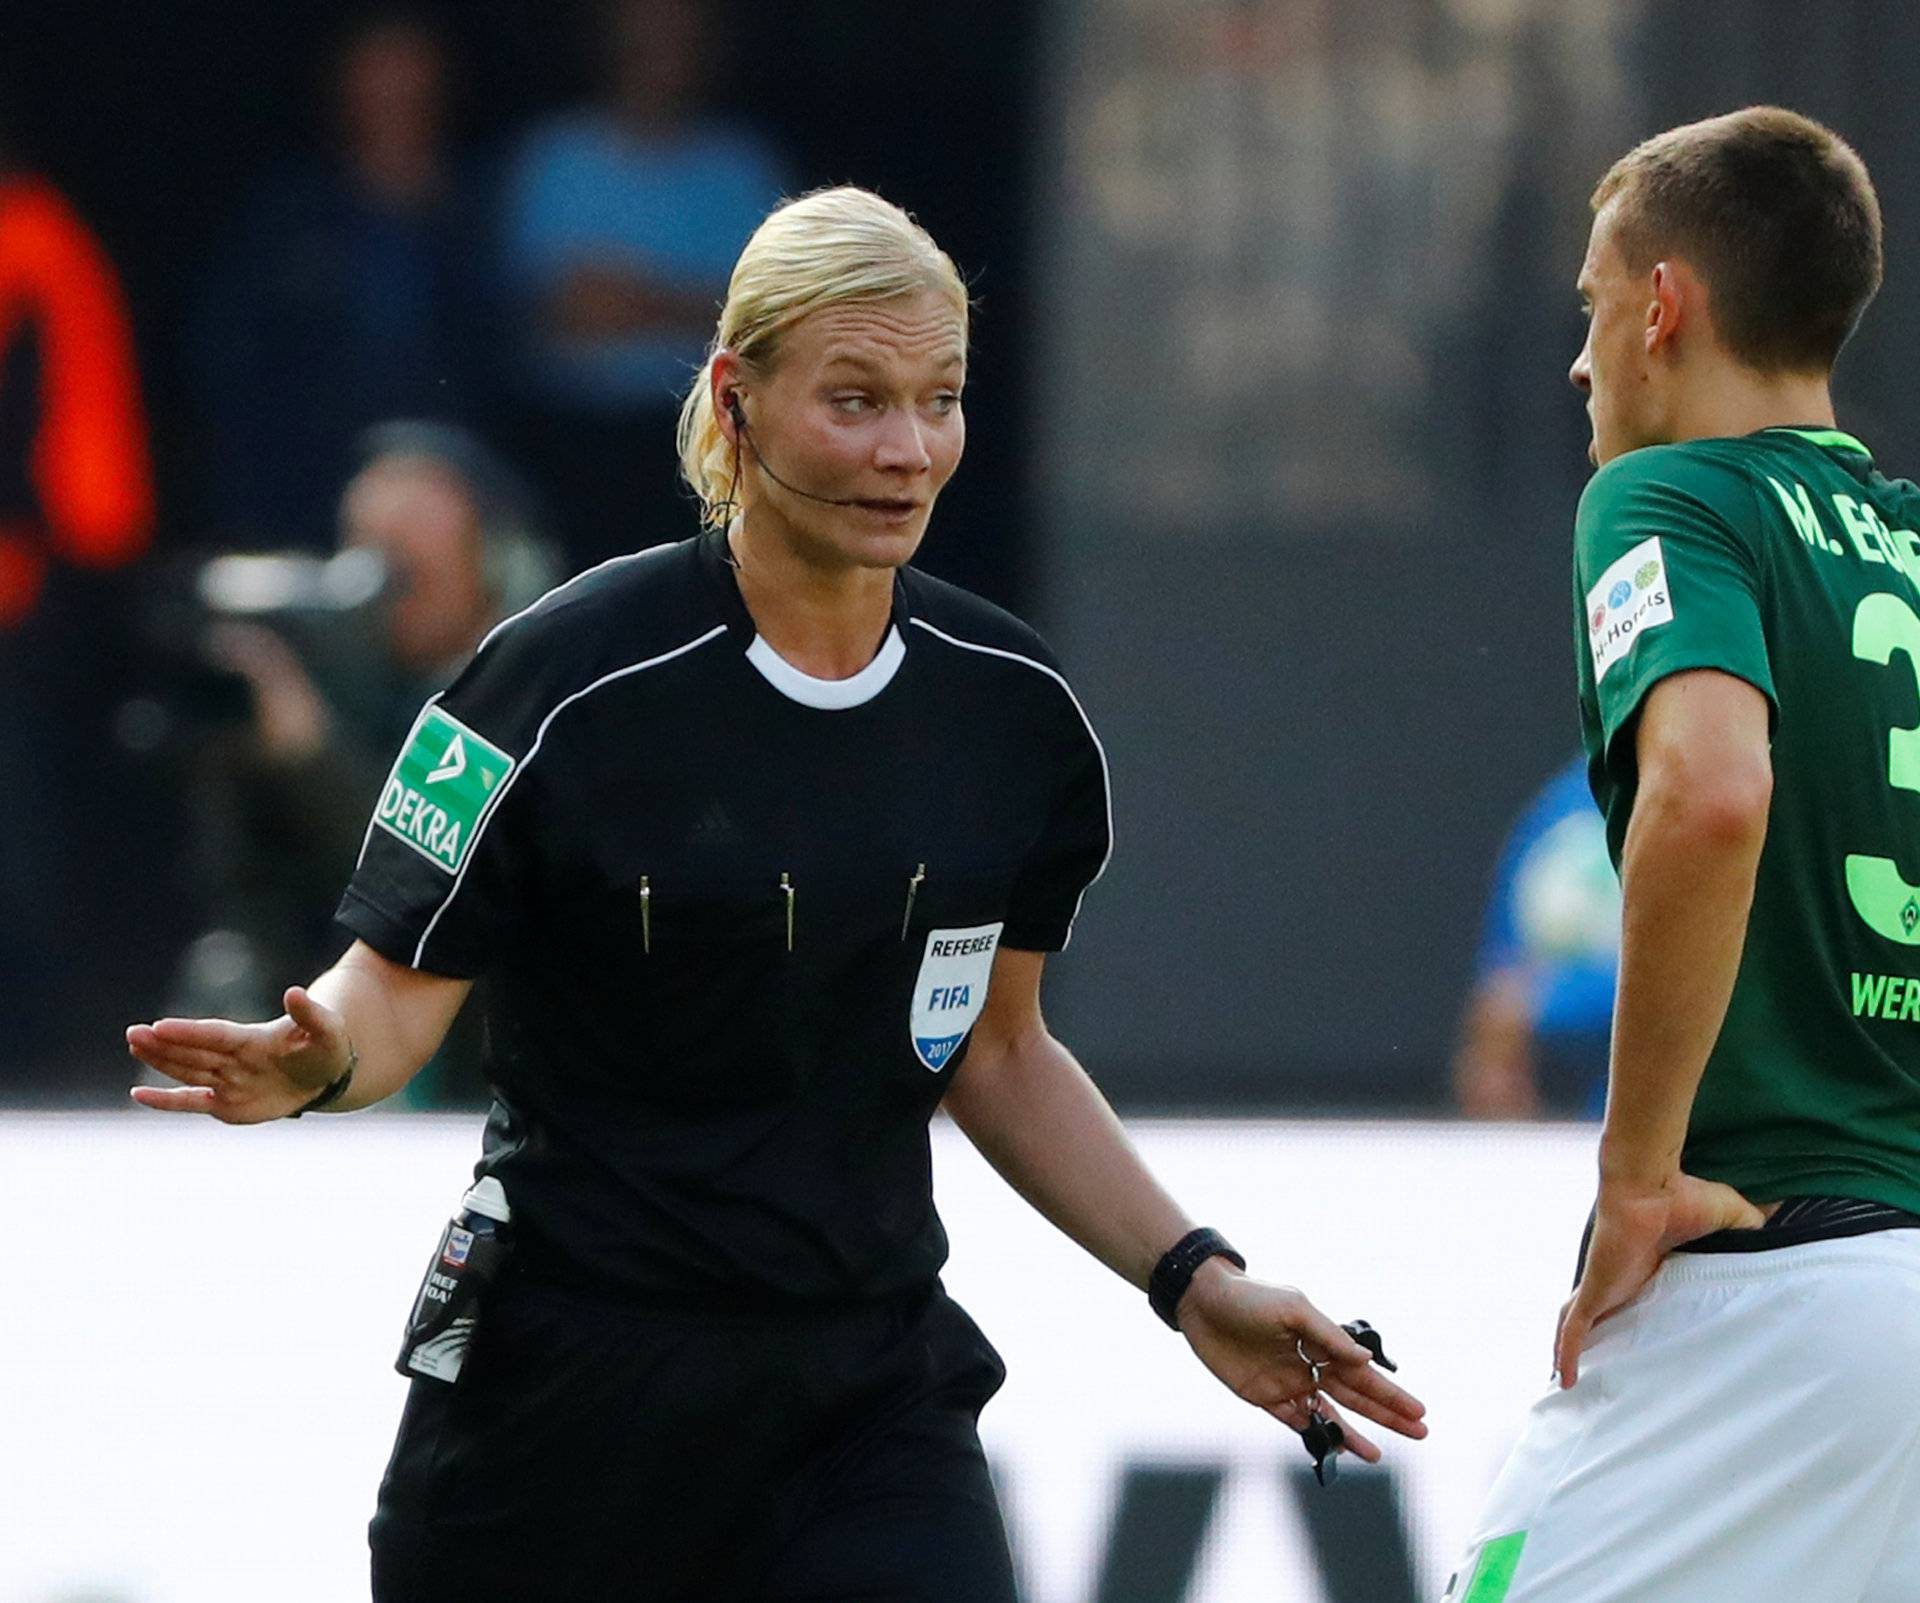 Bundesliga - Hertha BSC Berlin vs SV Werder Bremen